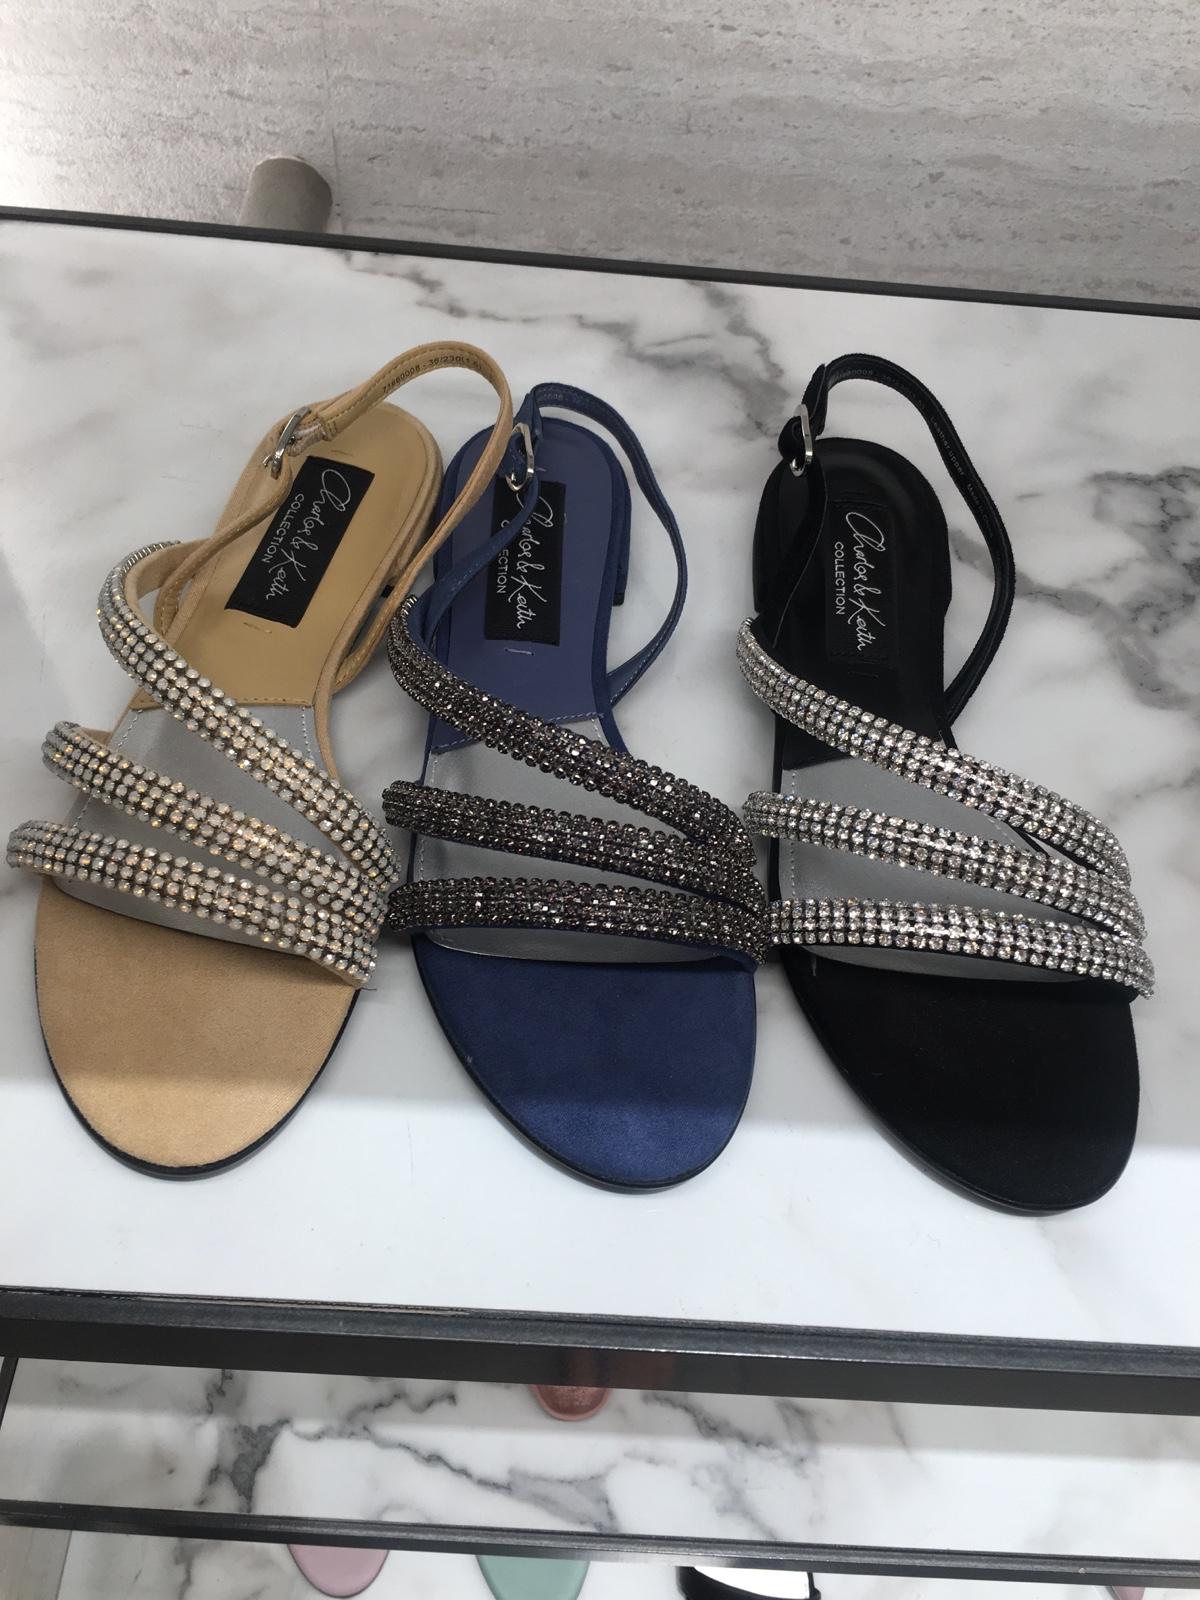 CHARLES&KEITH夏季凉鞋SL1-71660008欧美风平底细带装饰凉鞋